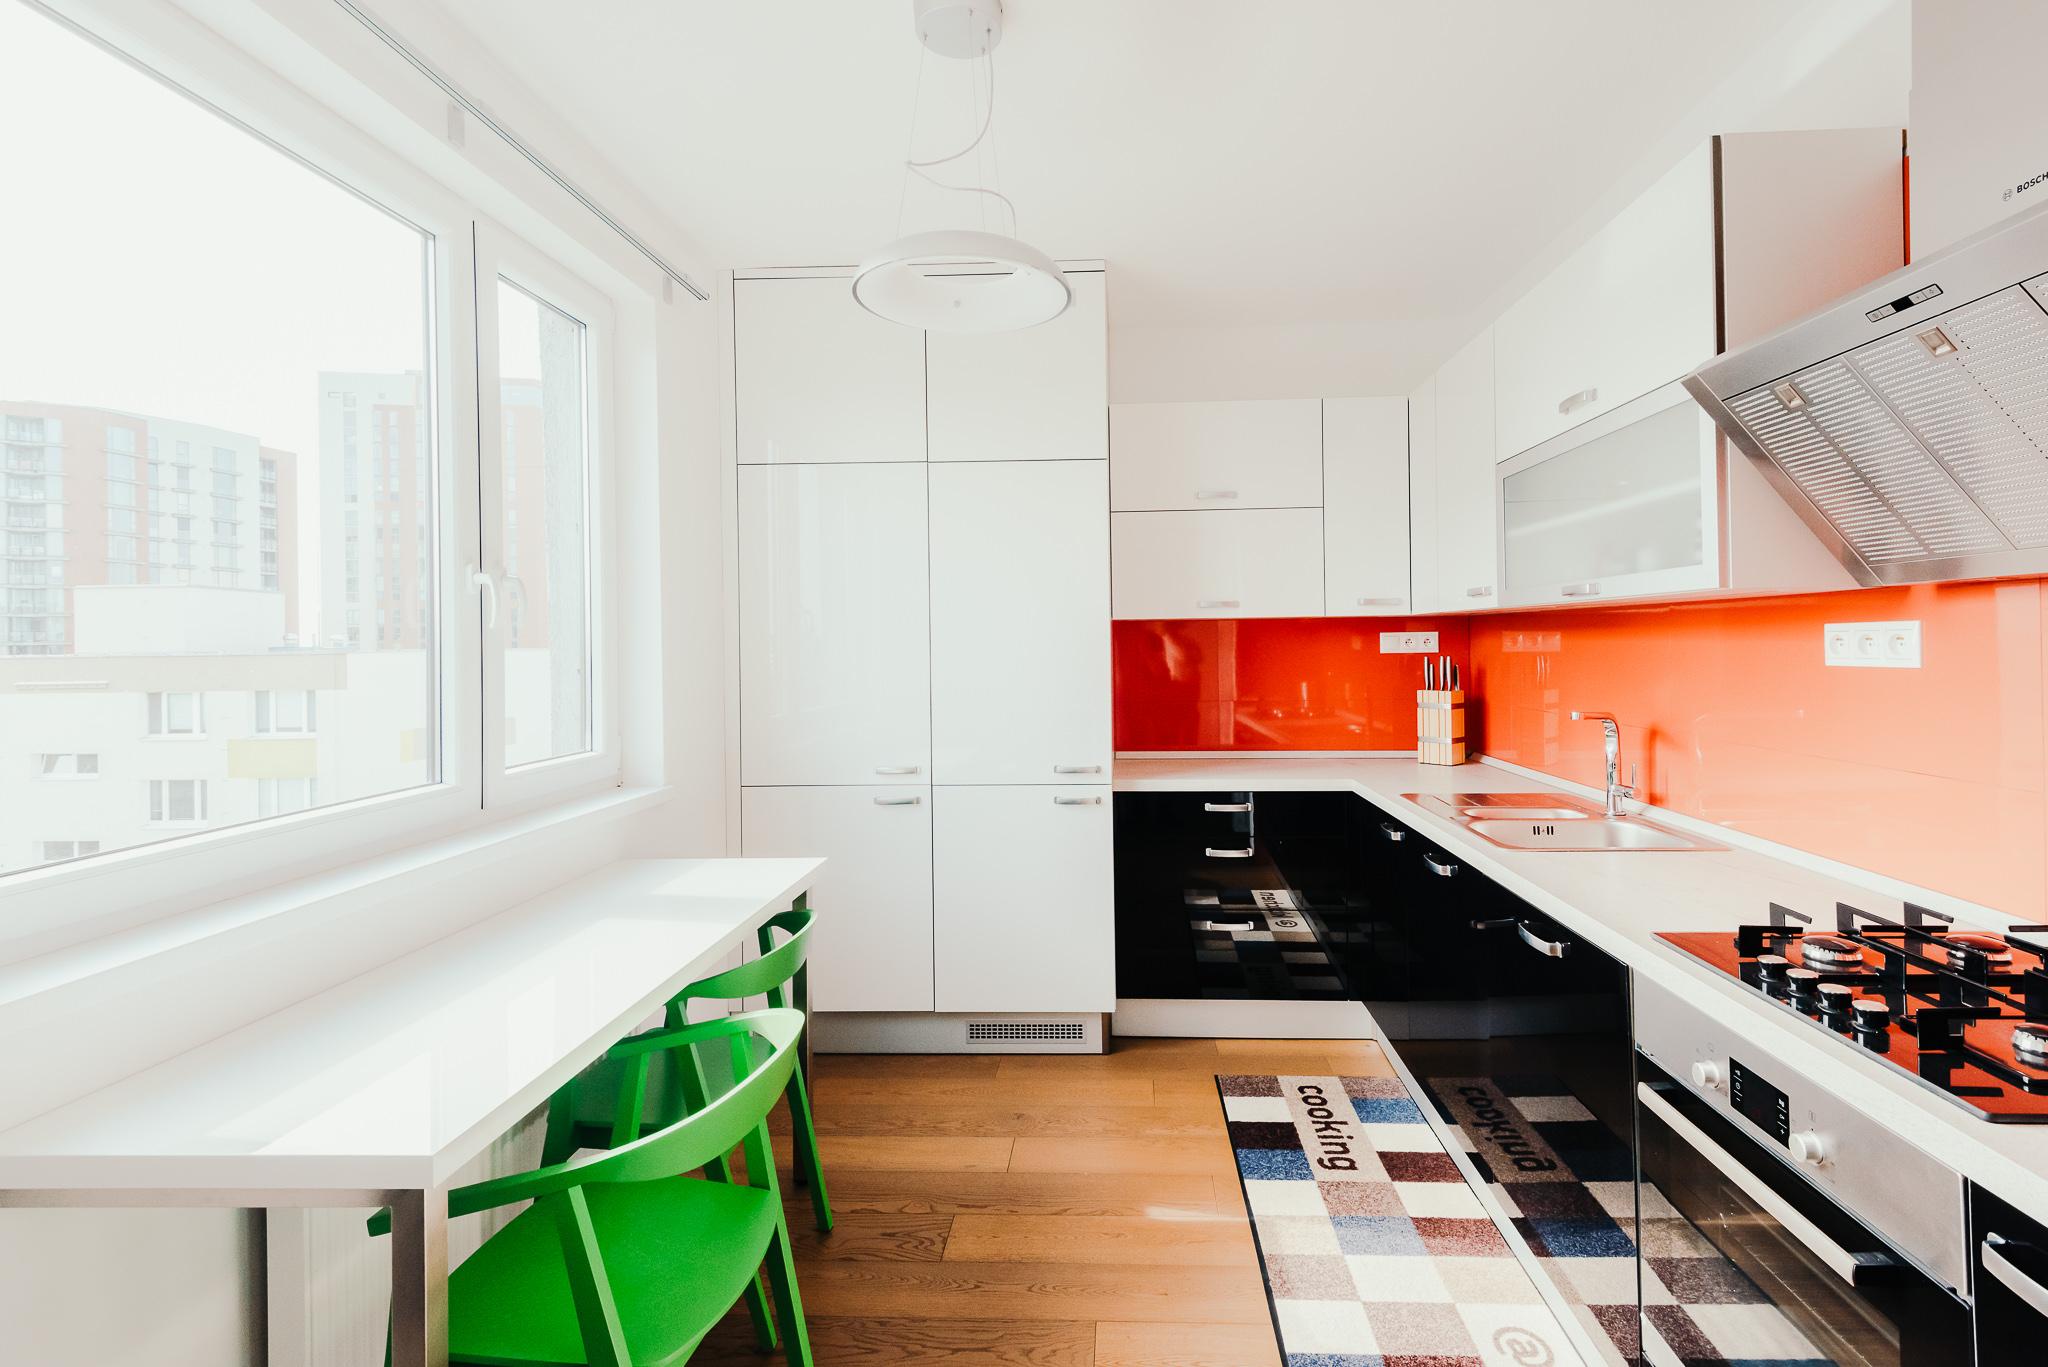 Byt, 3 - izbový, 74m2, Bratislava V - Petržalka, Vilová ulica